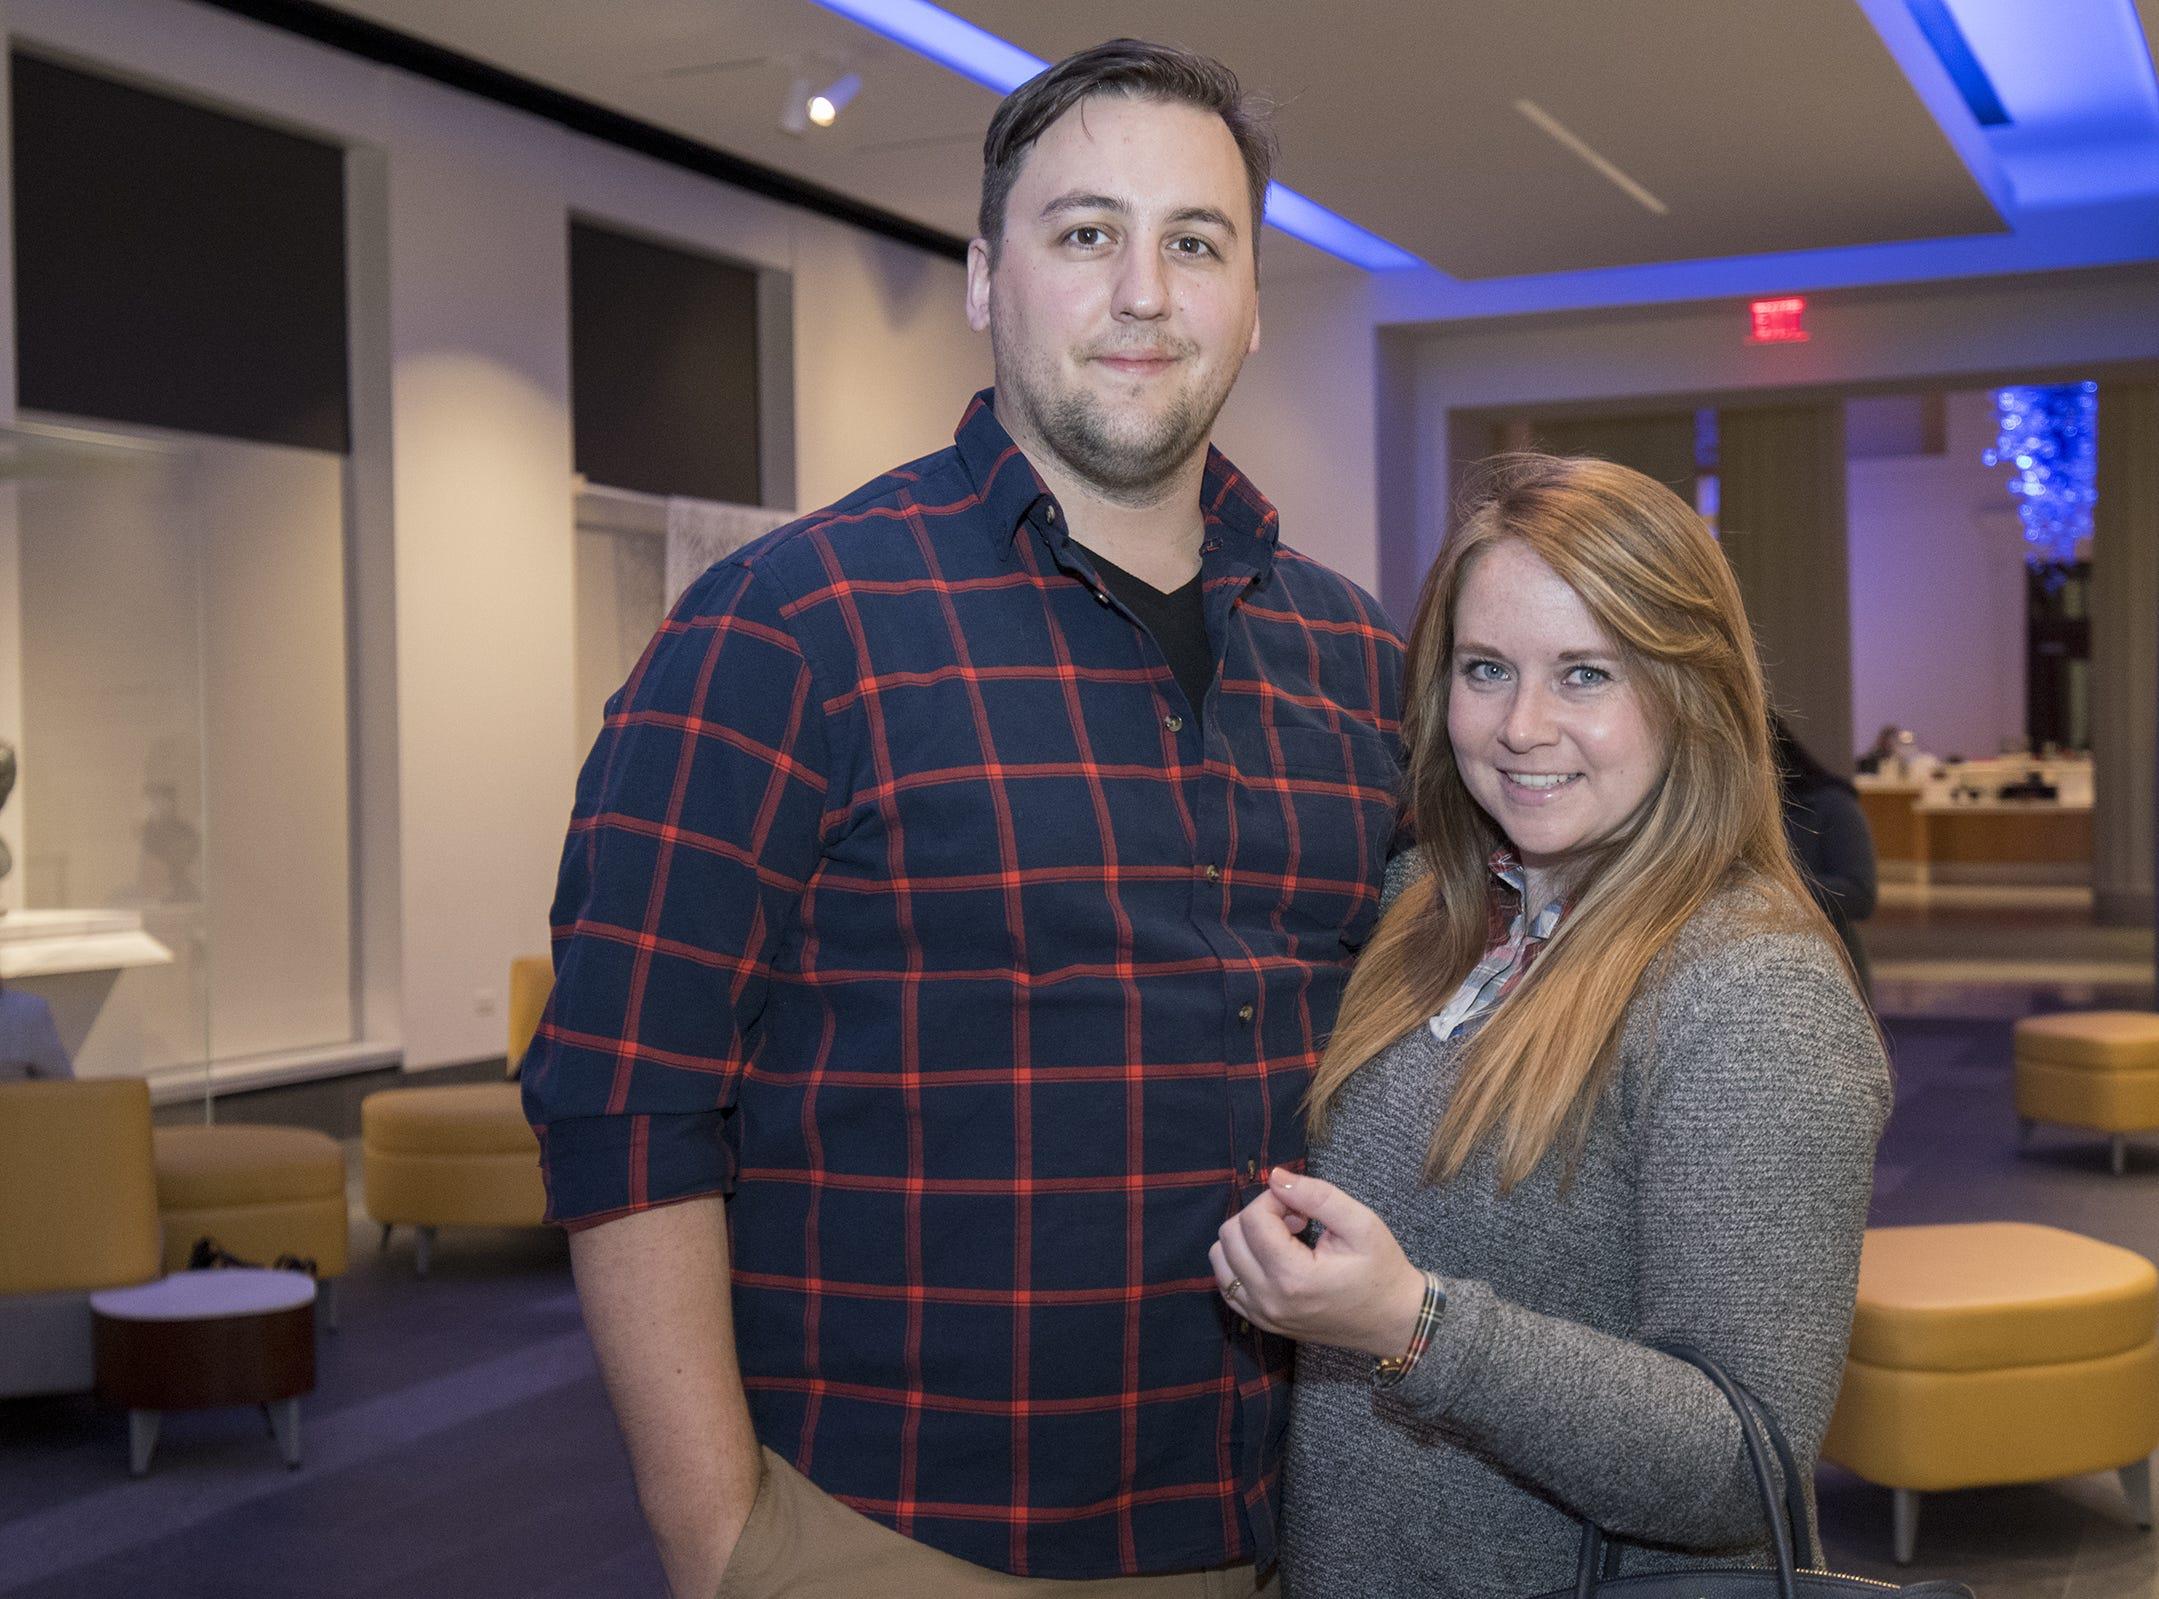 Dr. David and Elaine Cox of Mt. Adams attend Art After Dark at the Cincinnati Art Museum Wednesday, November 21, 2018 in Cincinnati, Ohio.